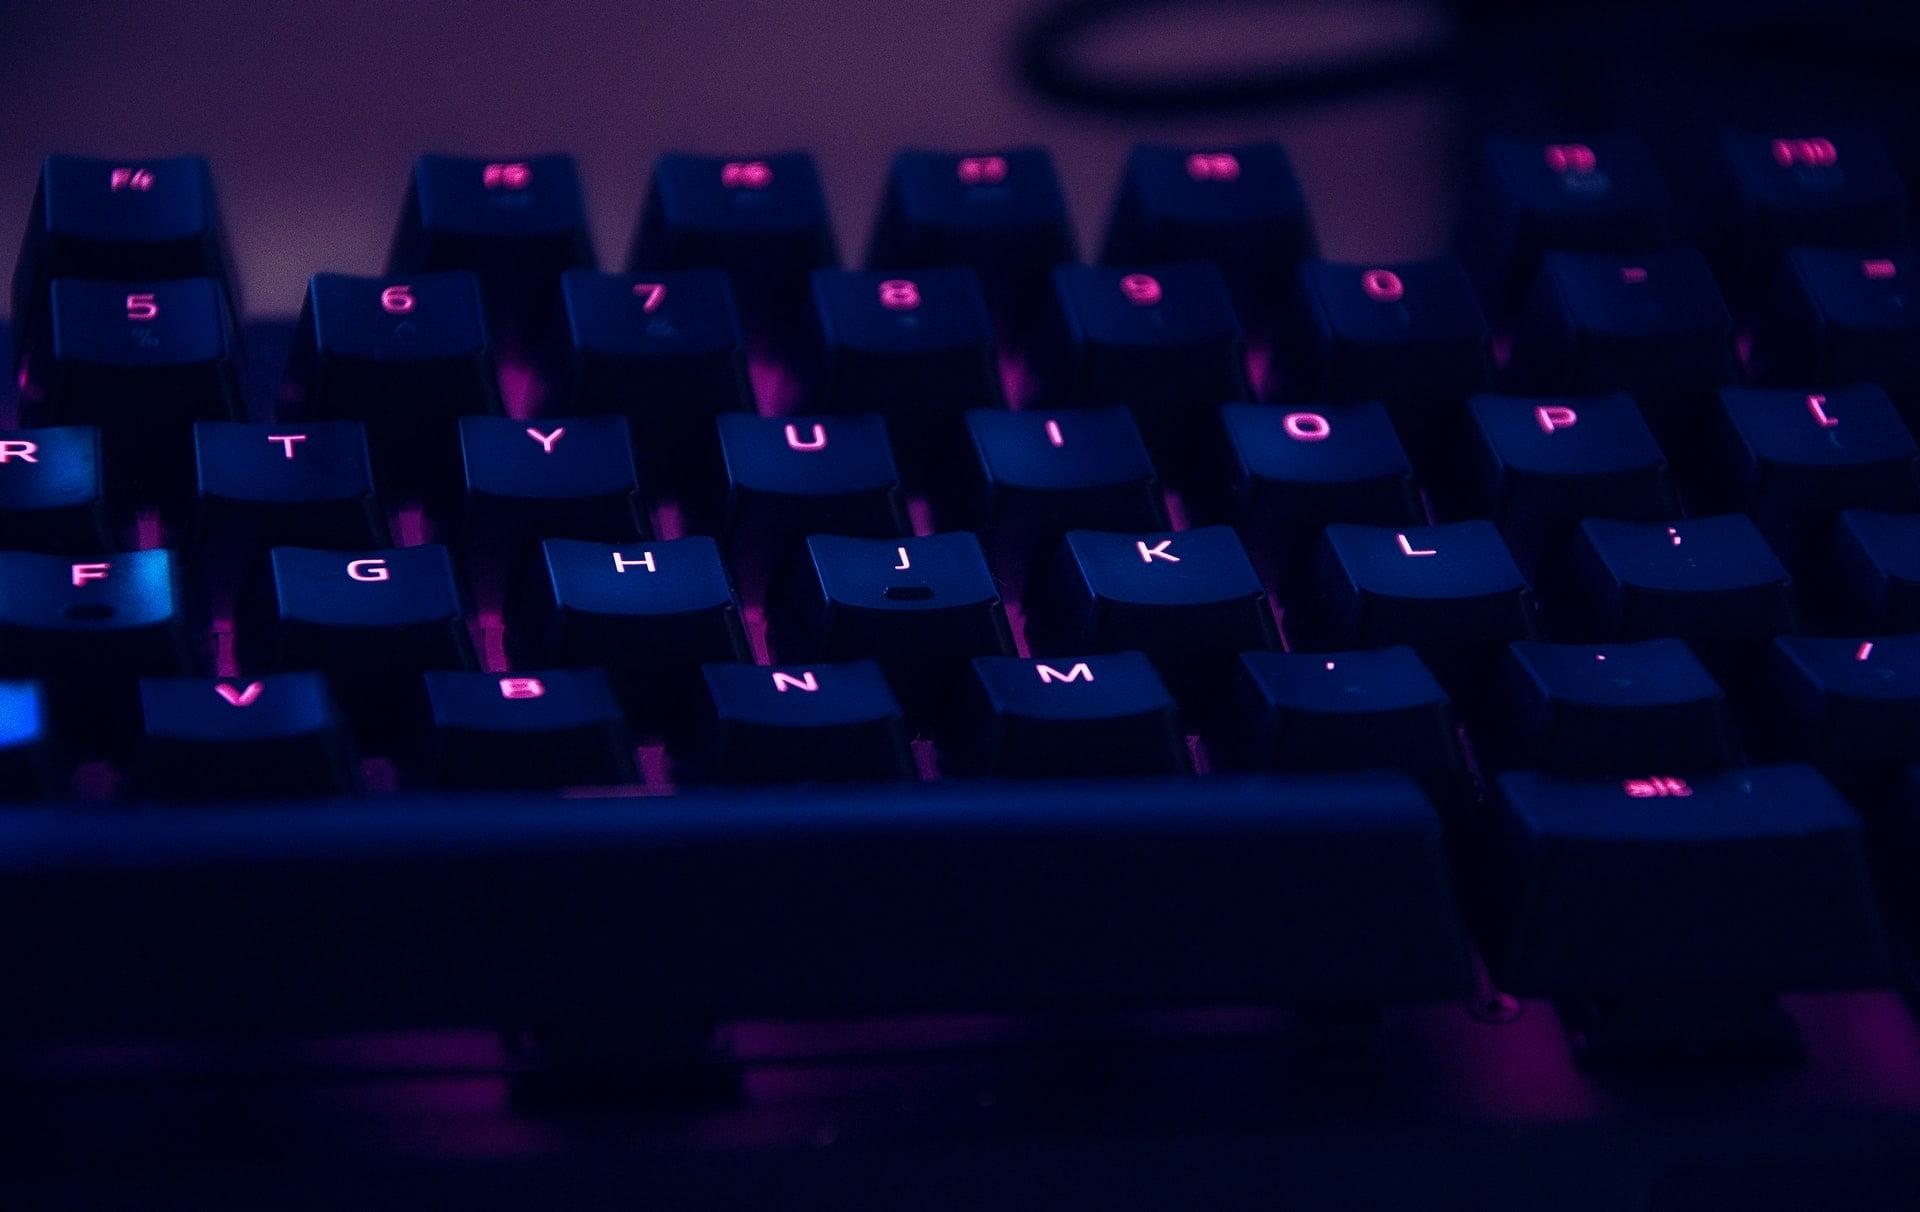 closeup of rgb pink keyboard with black keys